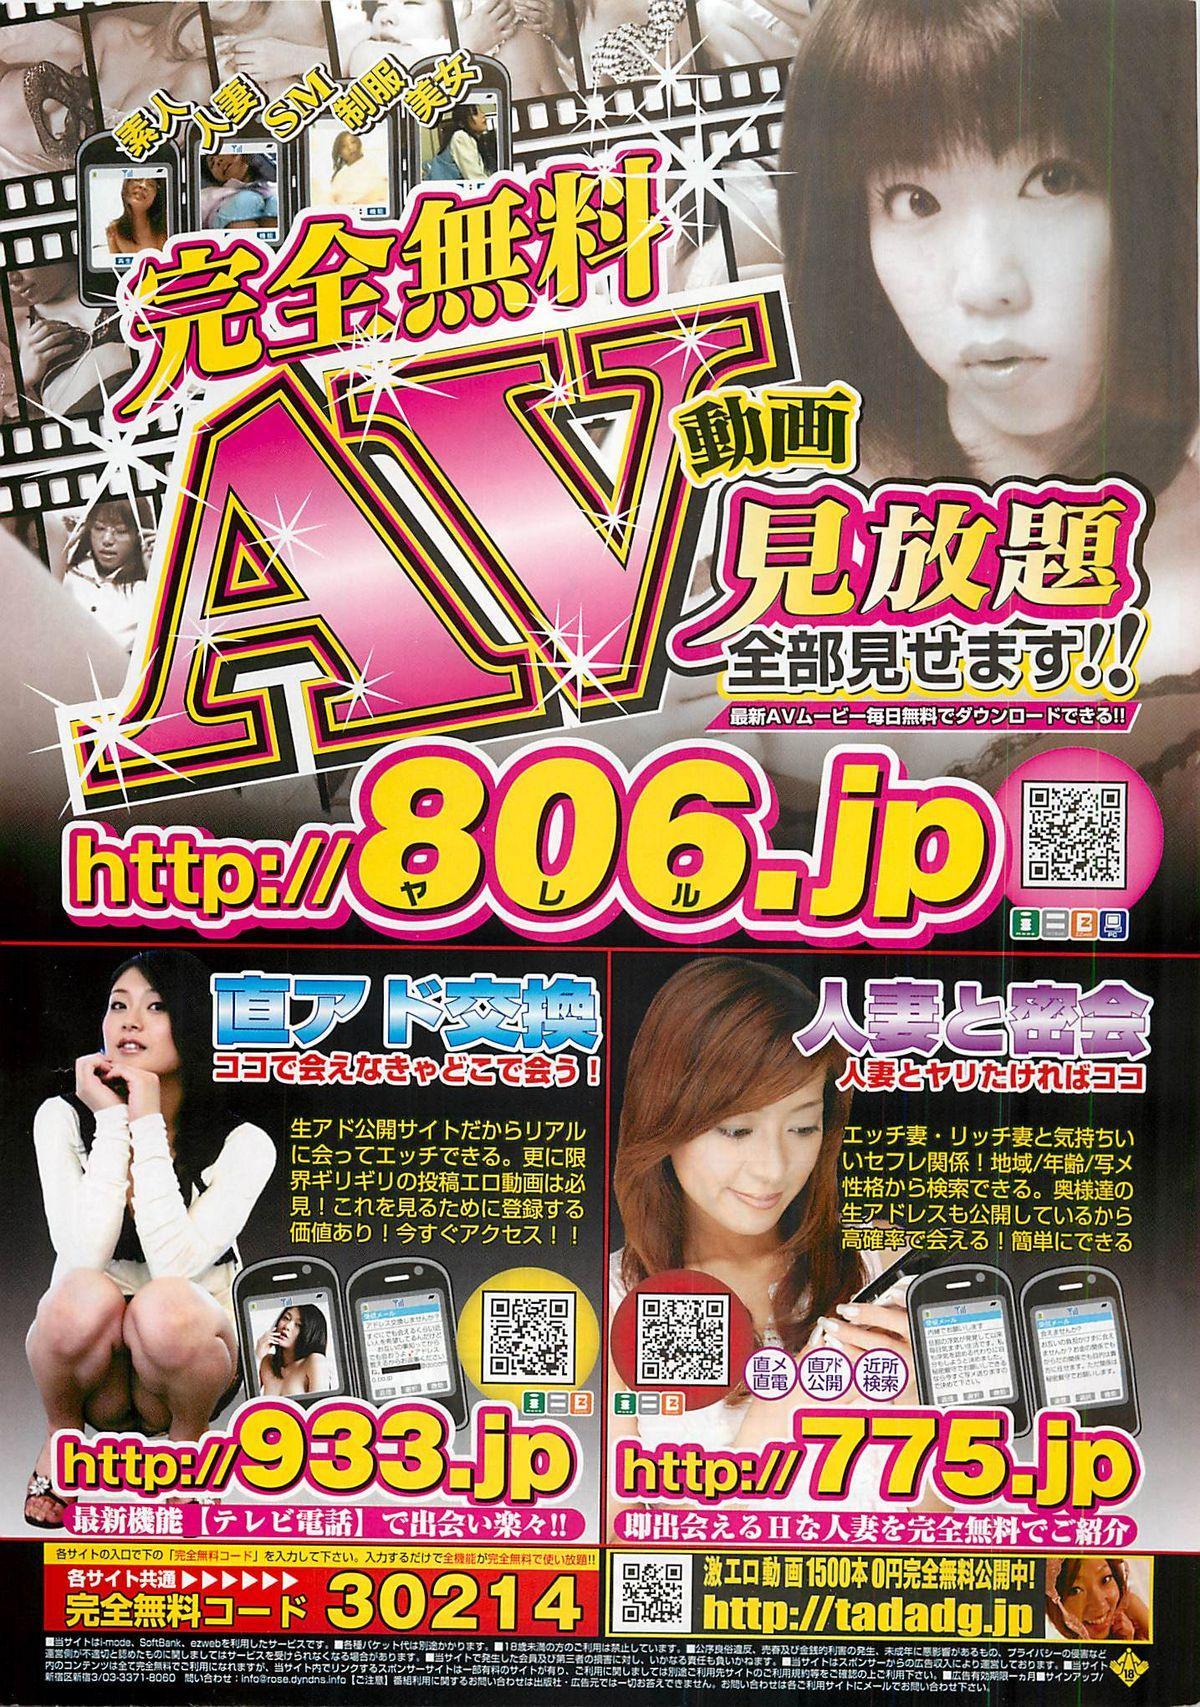 COMIC Penguin Club Sanzokuban 2007-03 250